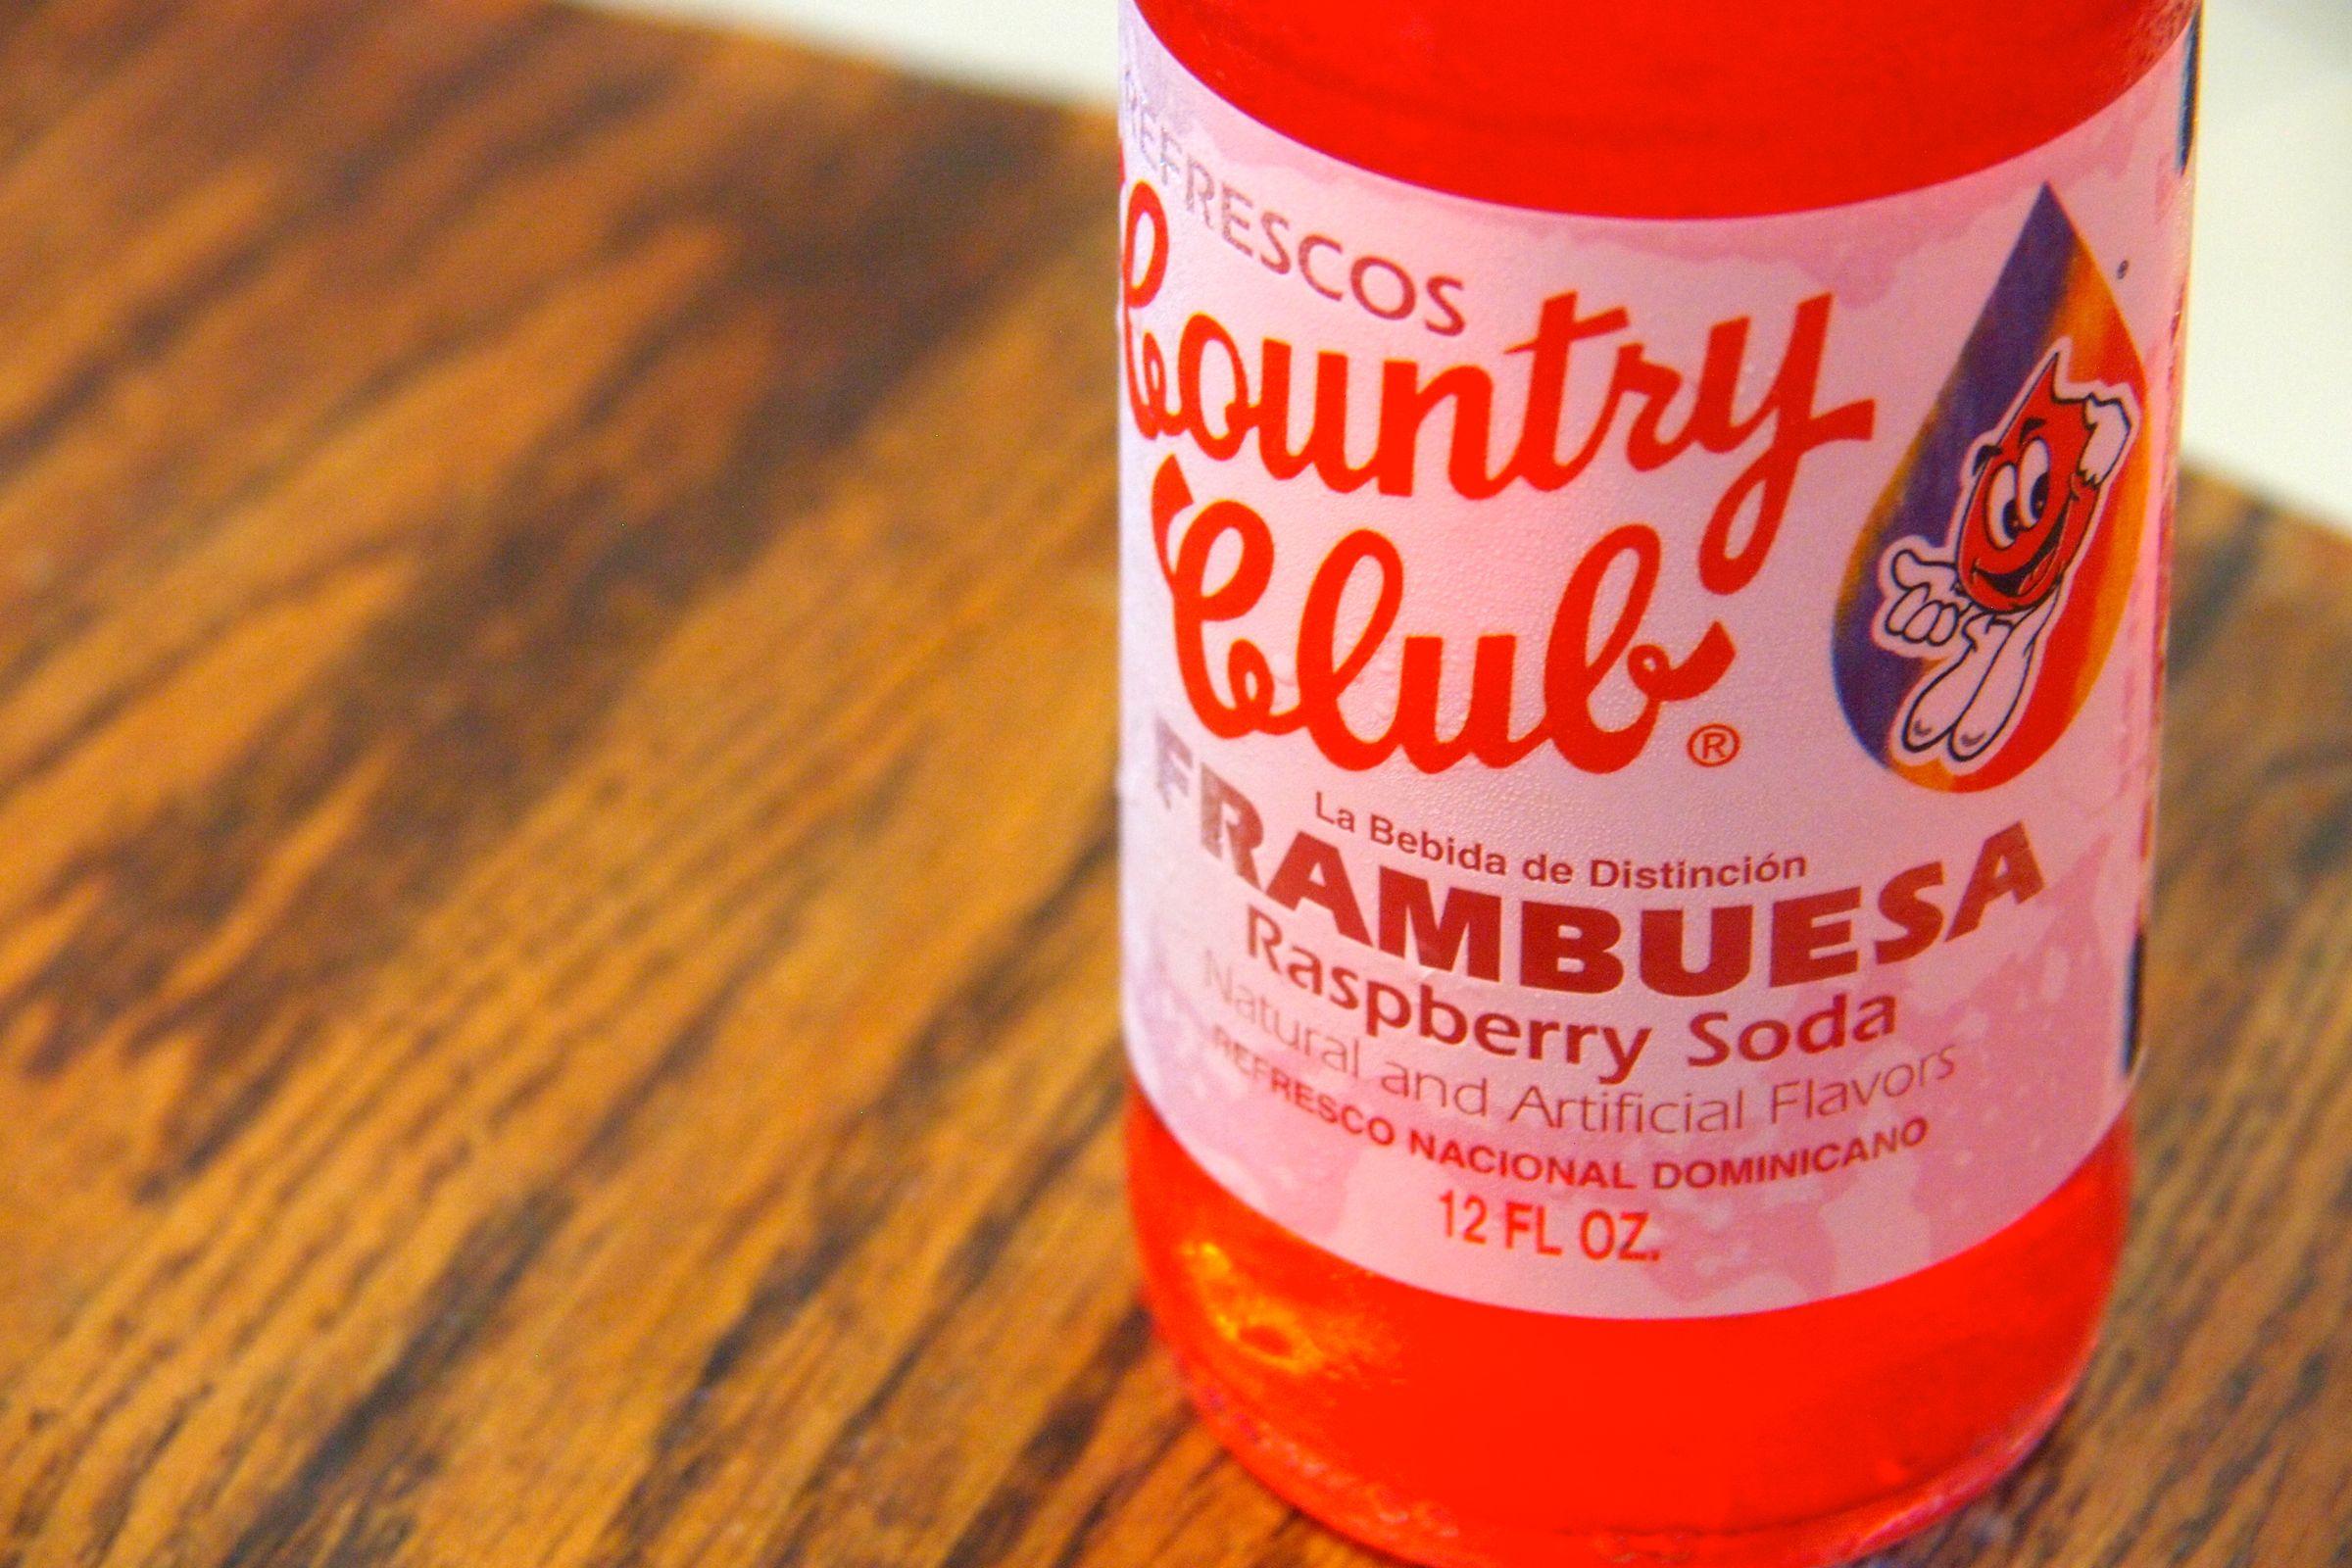 Taste Of The Caribbean Country Club Frambuesa Soda Rico